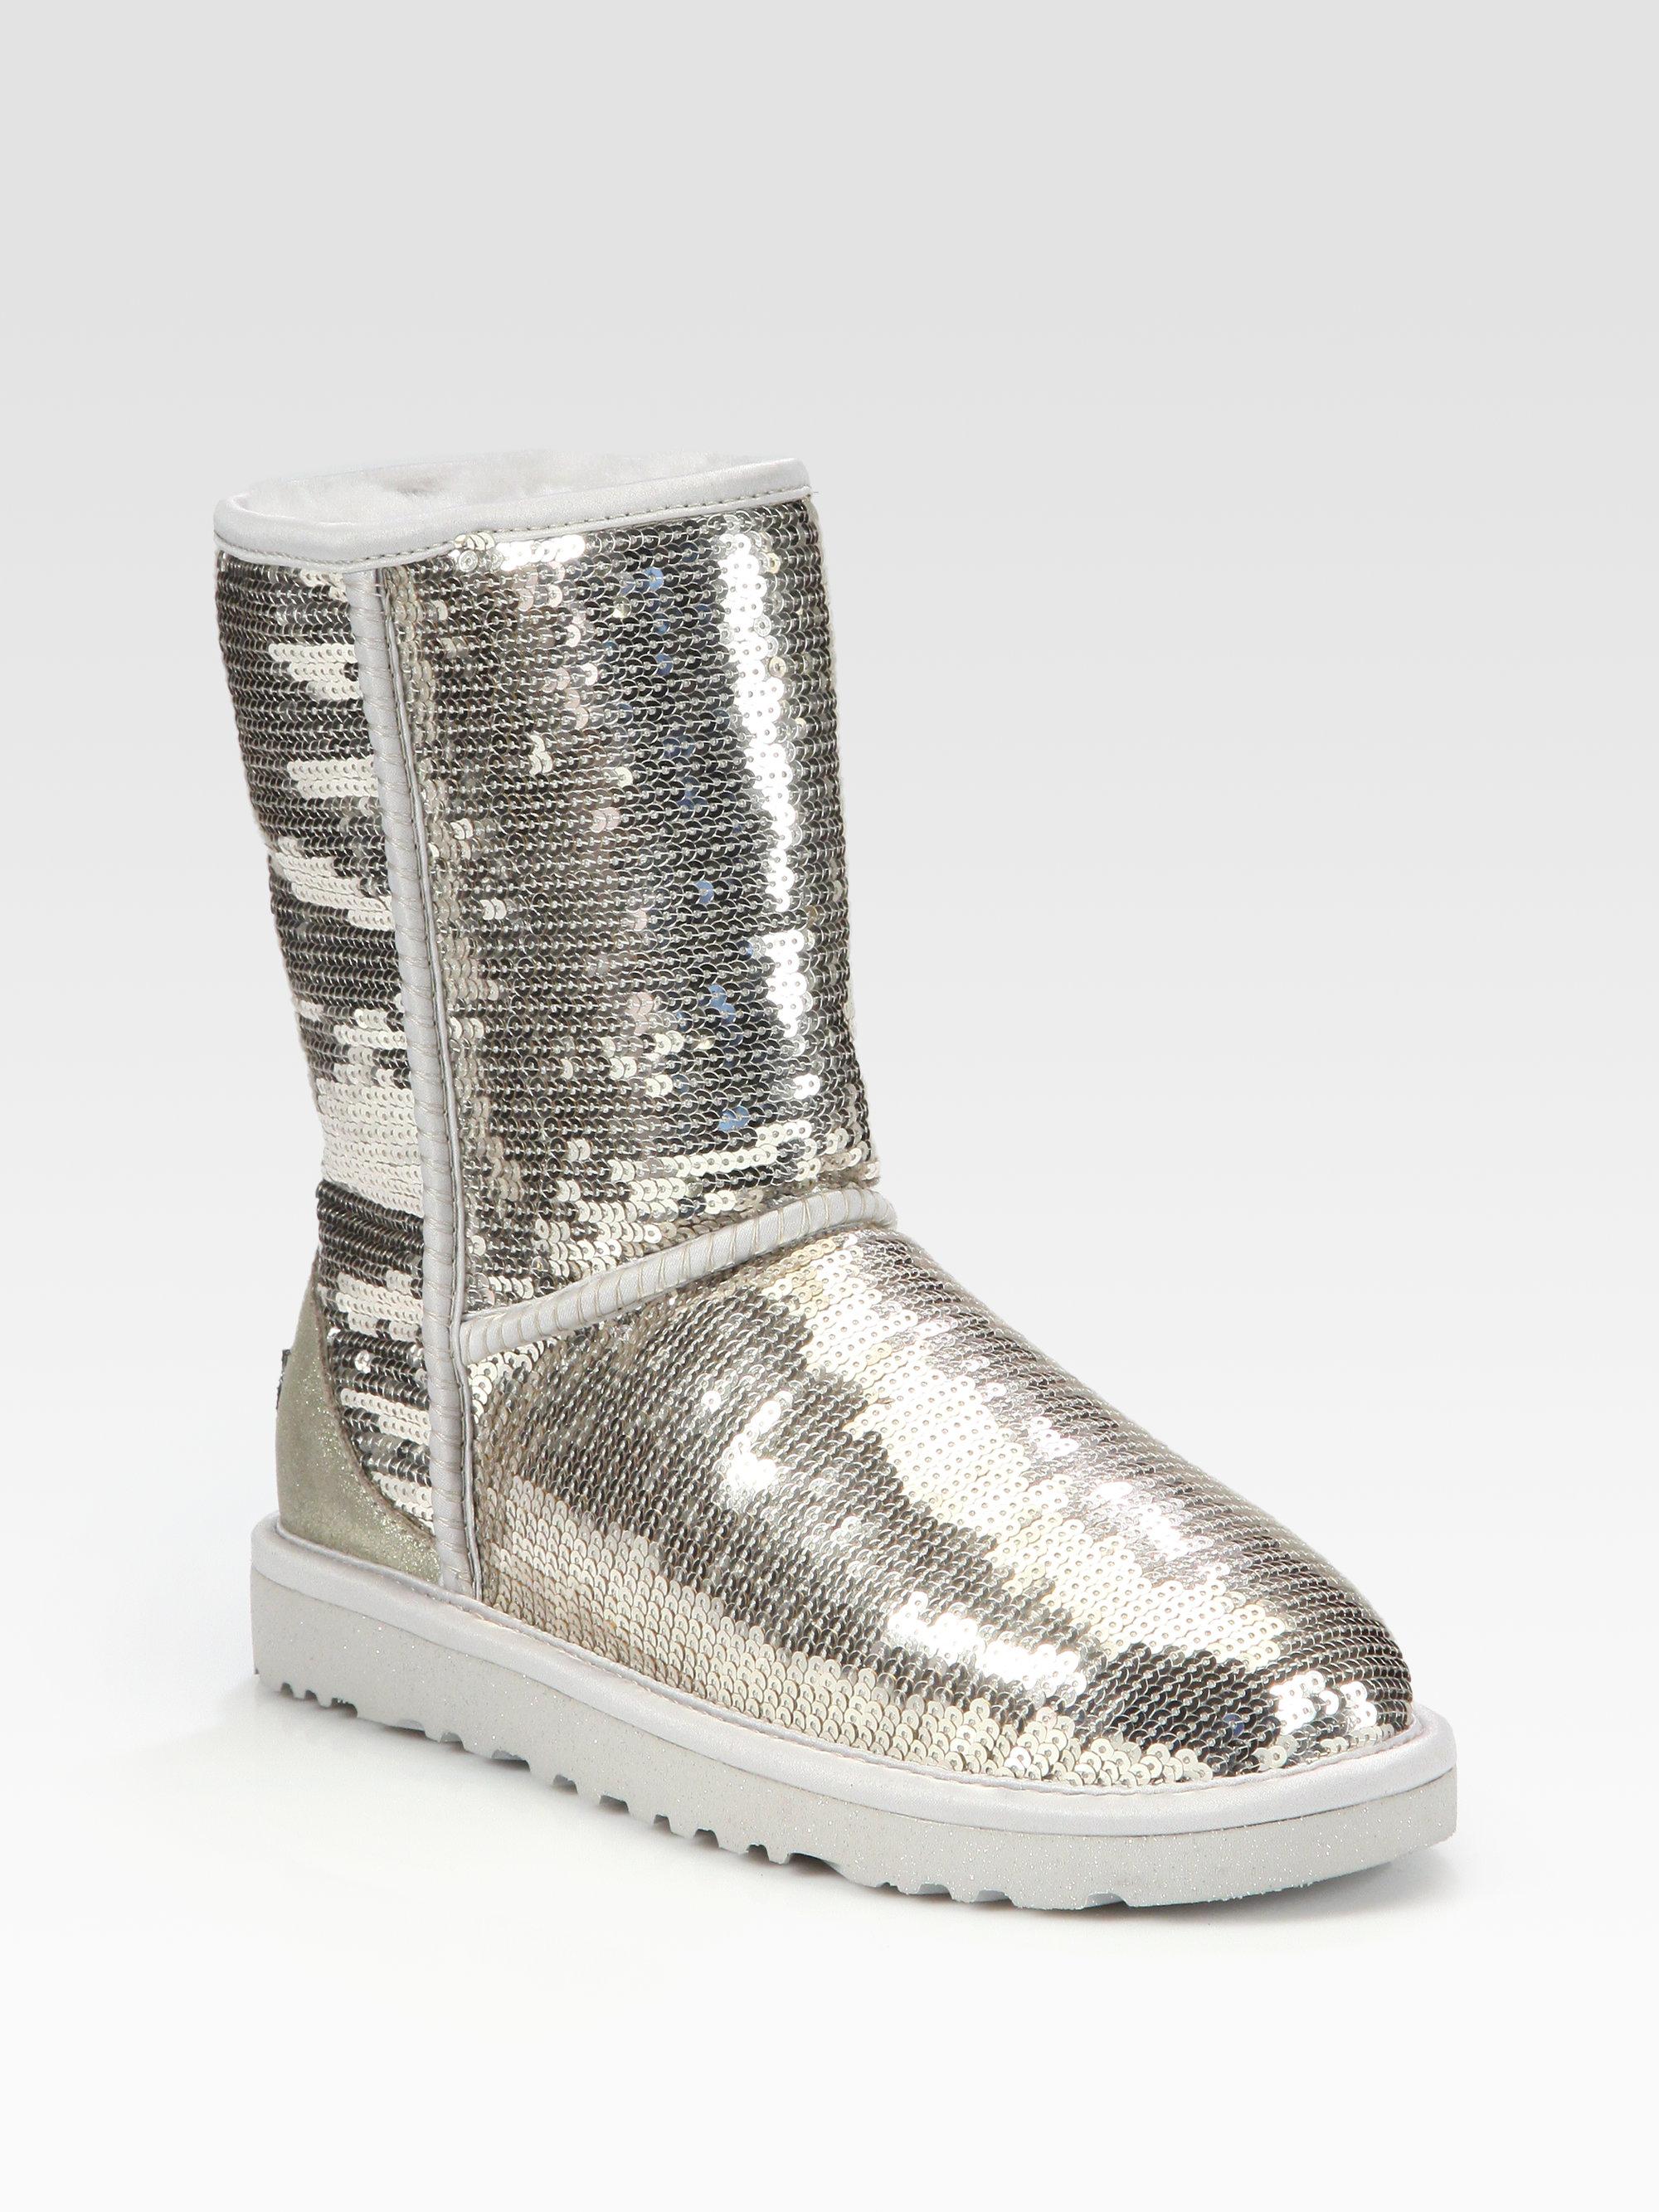 Ugg Boots Name